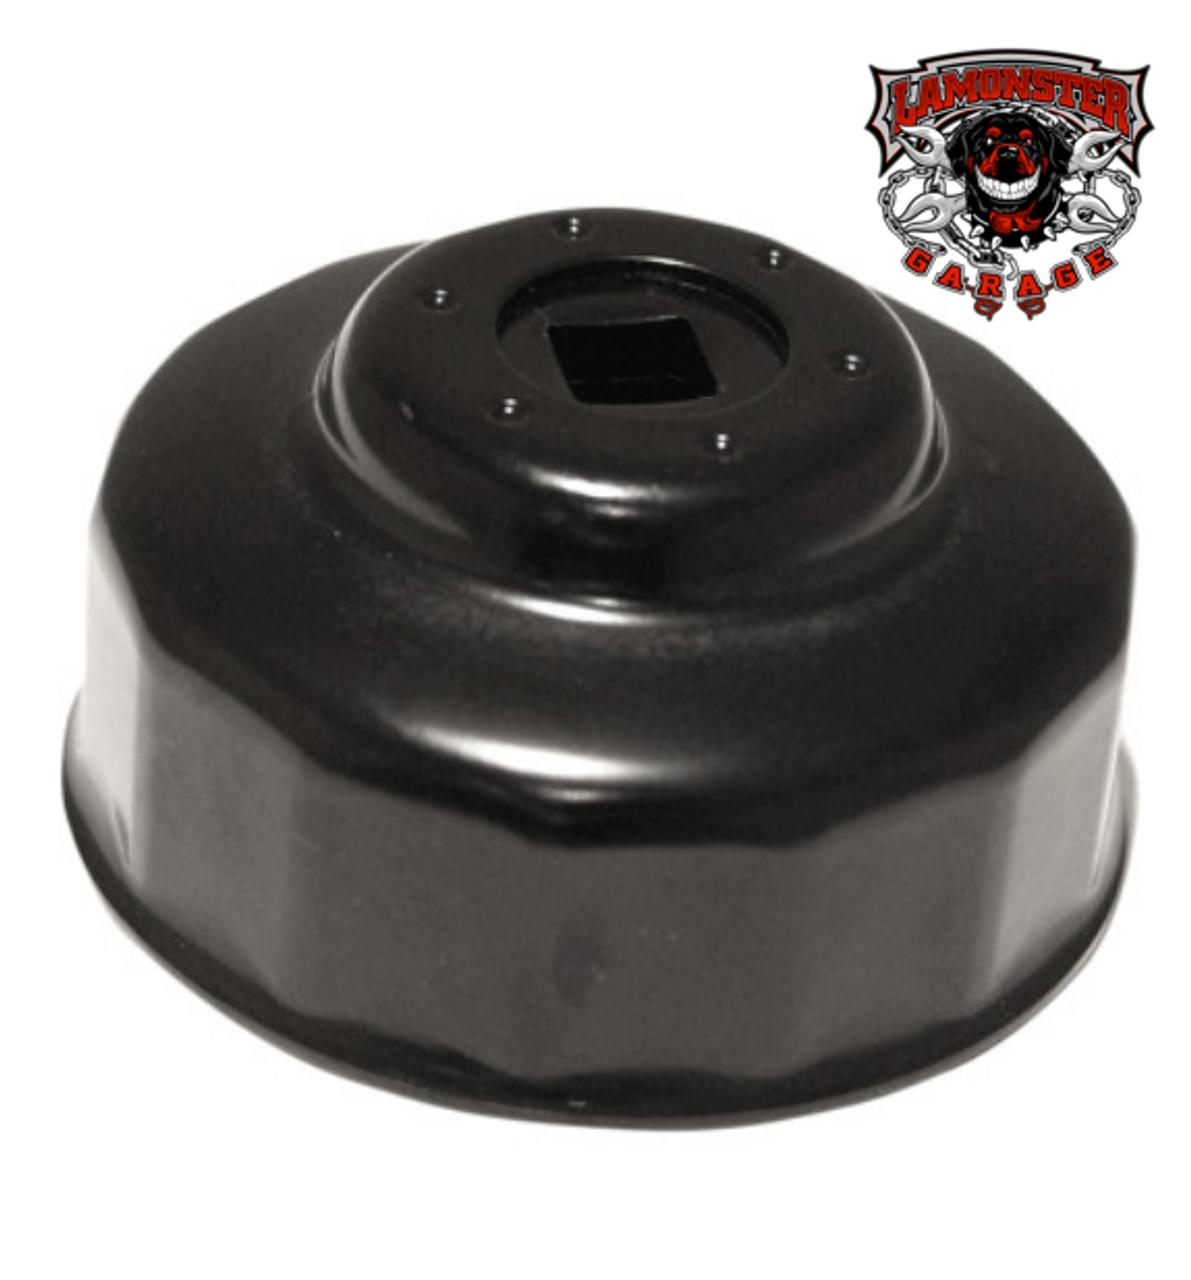 Oil Filter Wrench - 65 MM/14 - Honda / Kawasaki (HF-204 / HF-303 / HF-198) (LGA-0295) Lamonster Approved